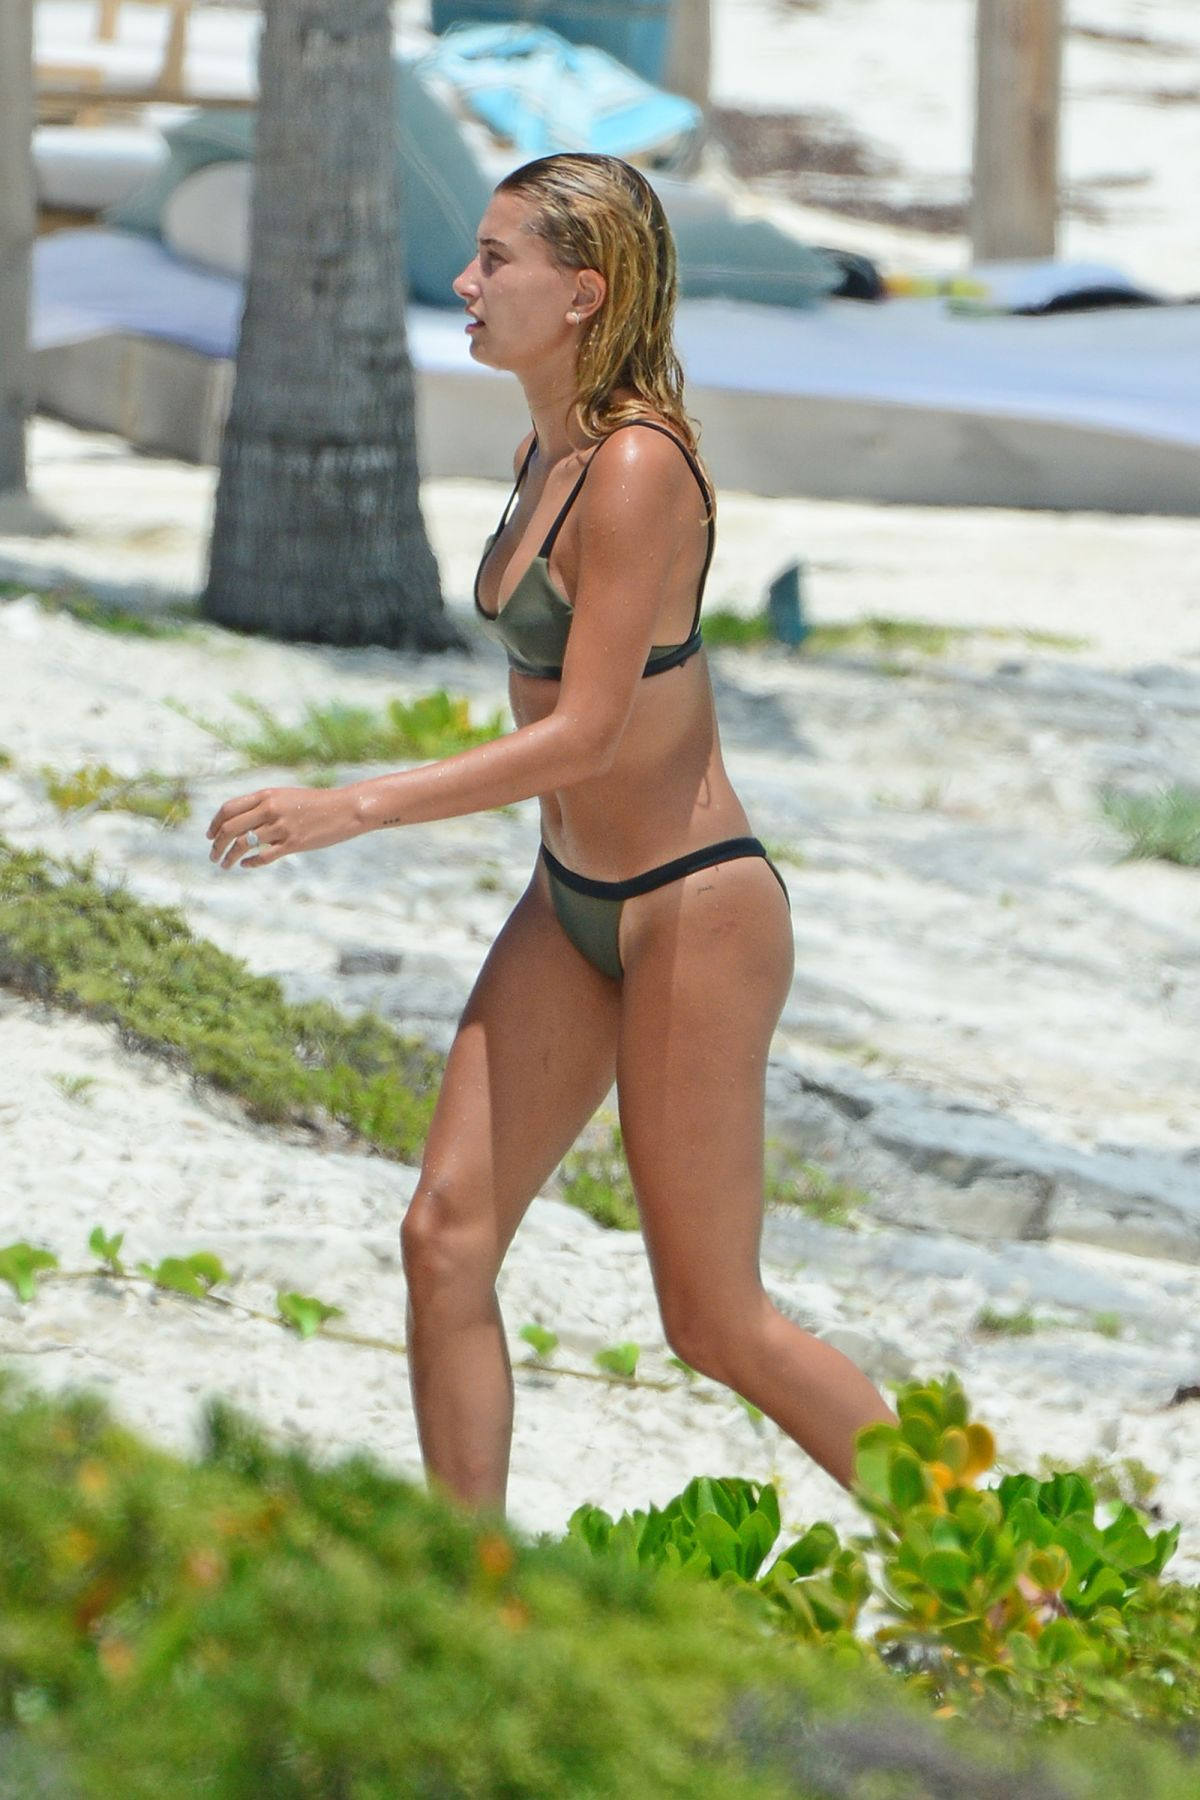 HAILEY BALDWIN in Bikini on the Beach in Turks and Caicos 08/12/2016